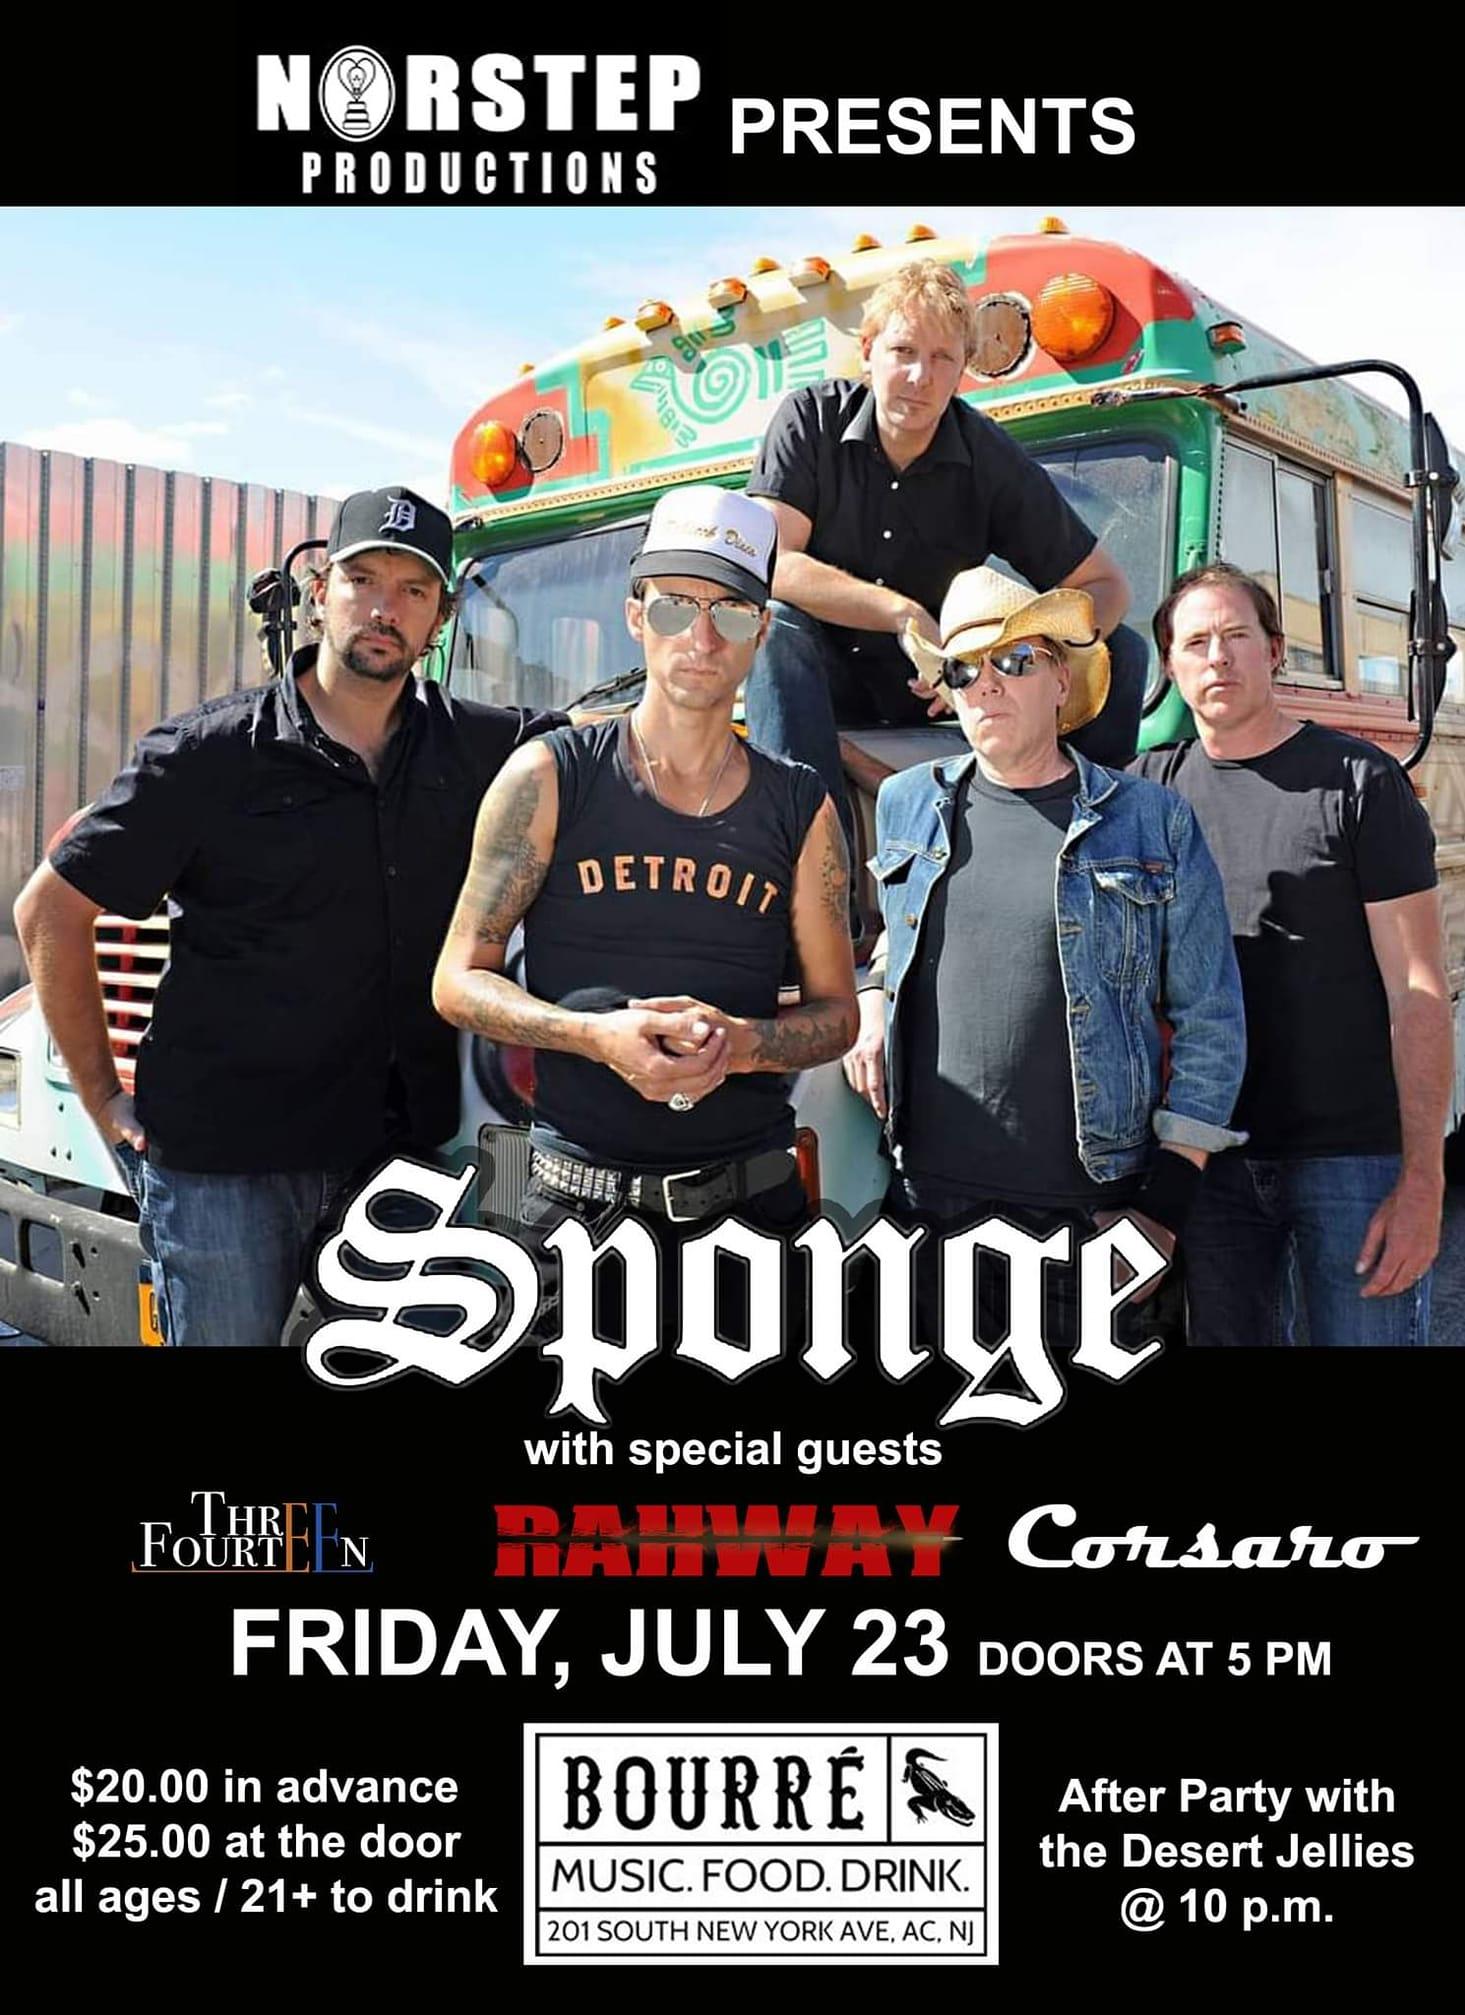 Three Fourteen at Bourre Atlantic City on 7/23/21